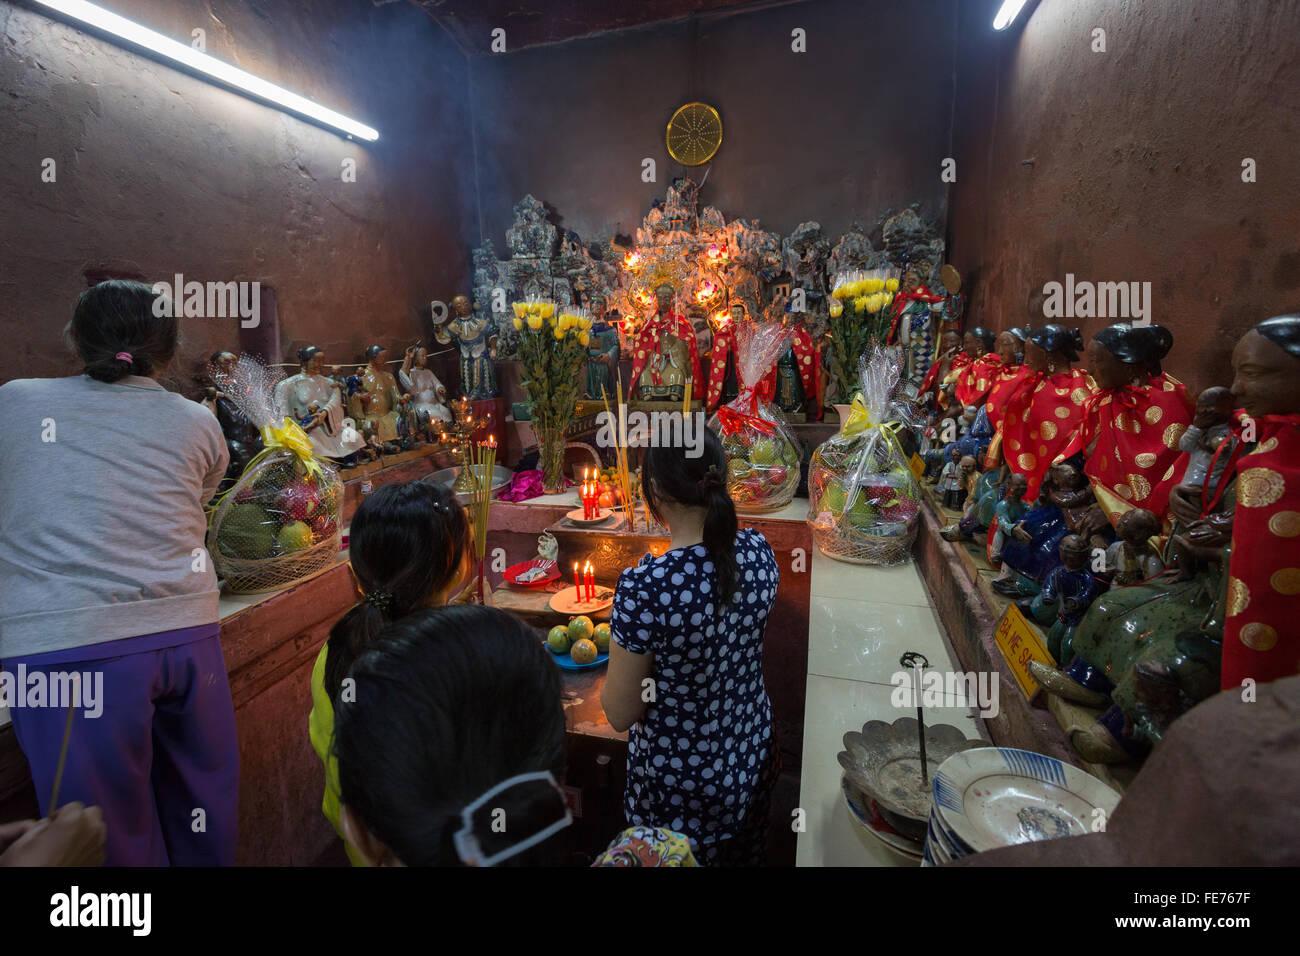 SAIGON, VIETNAM - JANUARY 27, 2014: Altar in Emperor Jade Stock Photo